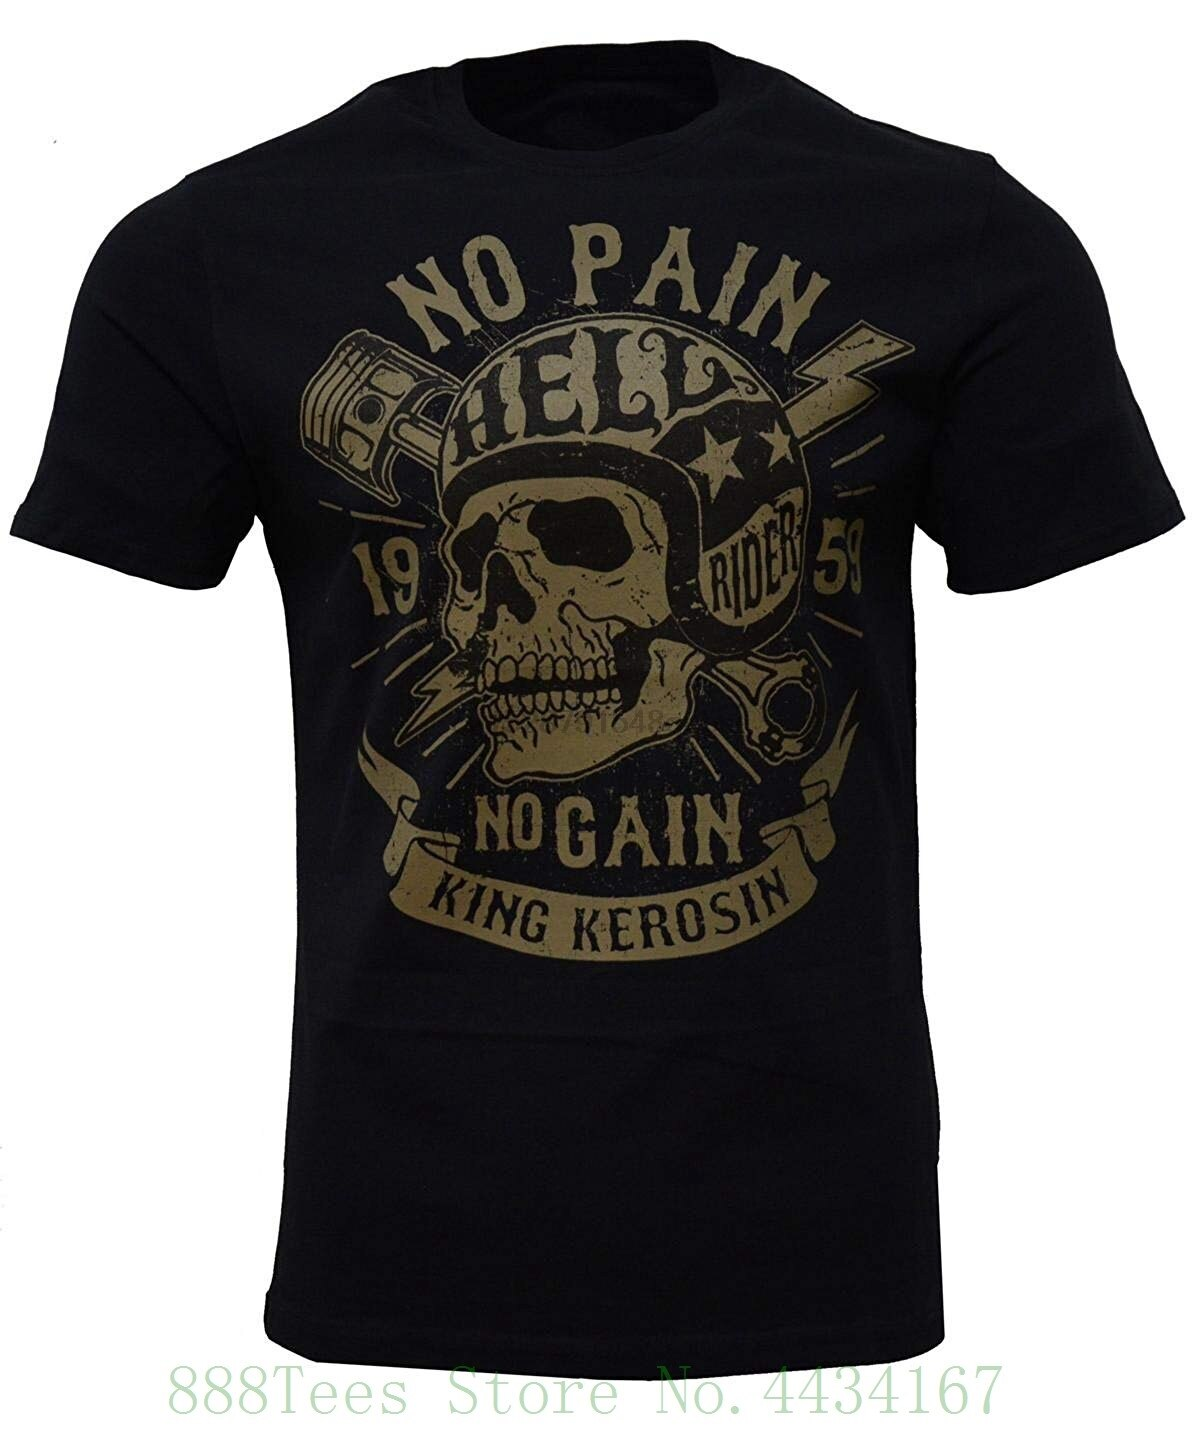 Rei kerosin nenhuma dor nenhum ganho regular t camisa preto impresso t camisa 2018 marca de moda